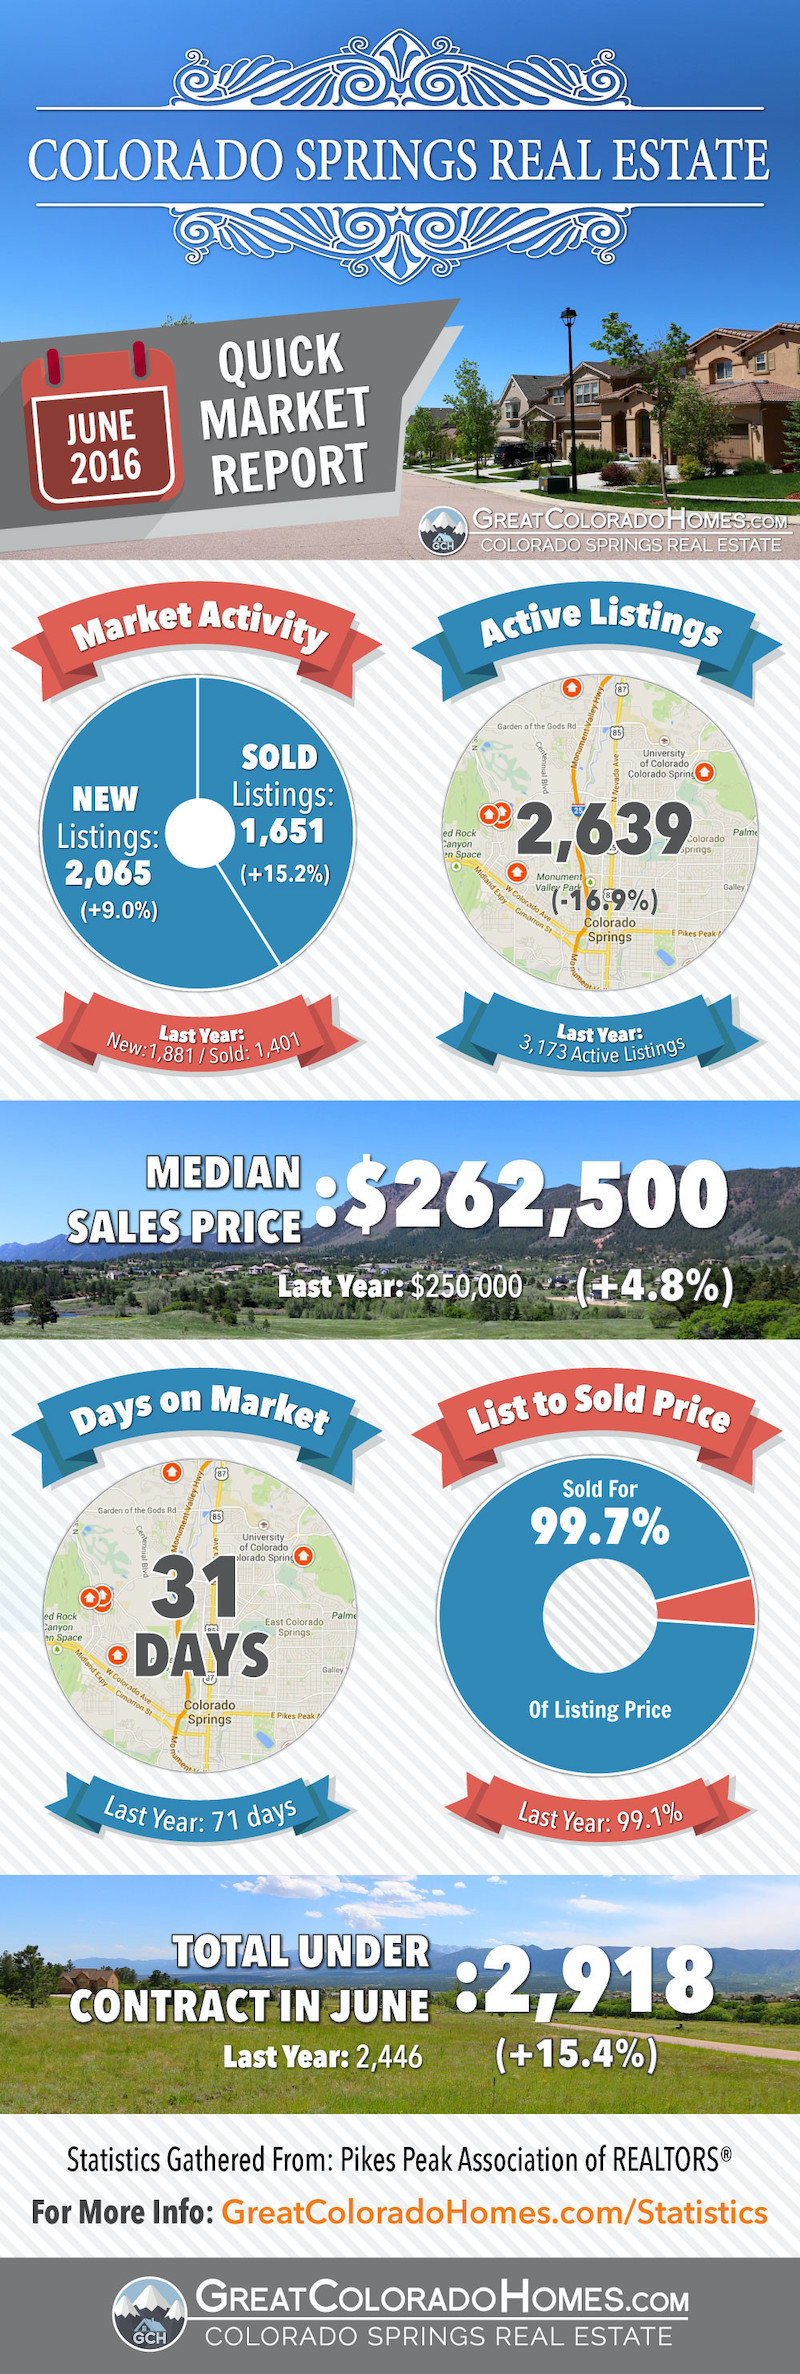 June 2016 Colorado Springs Real Estate Market Report